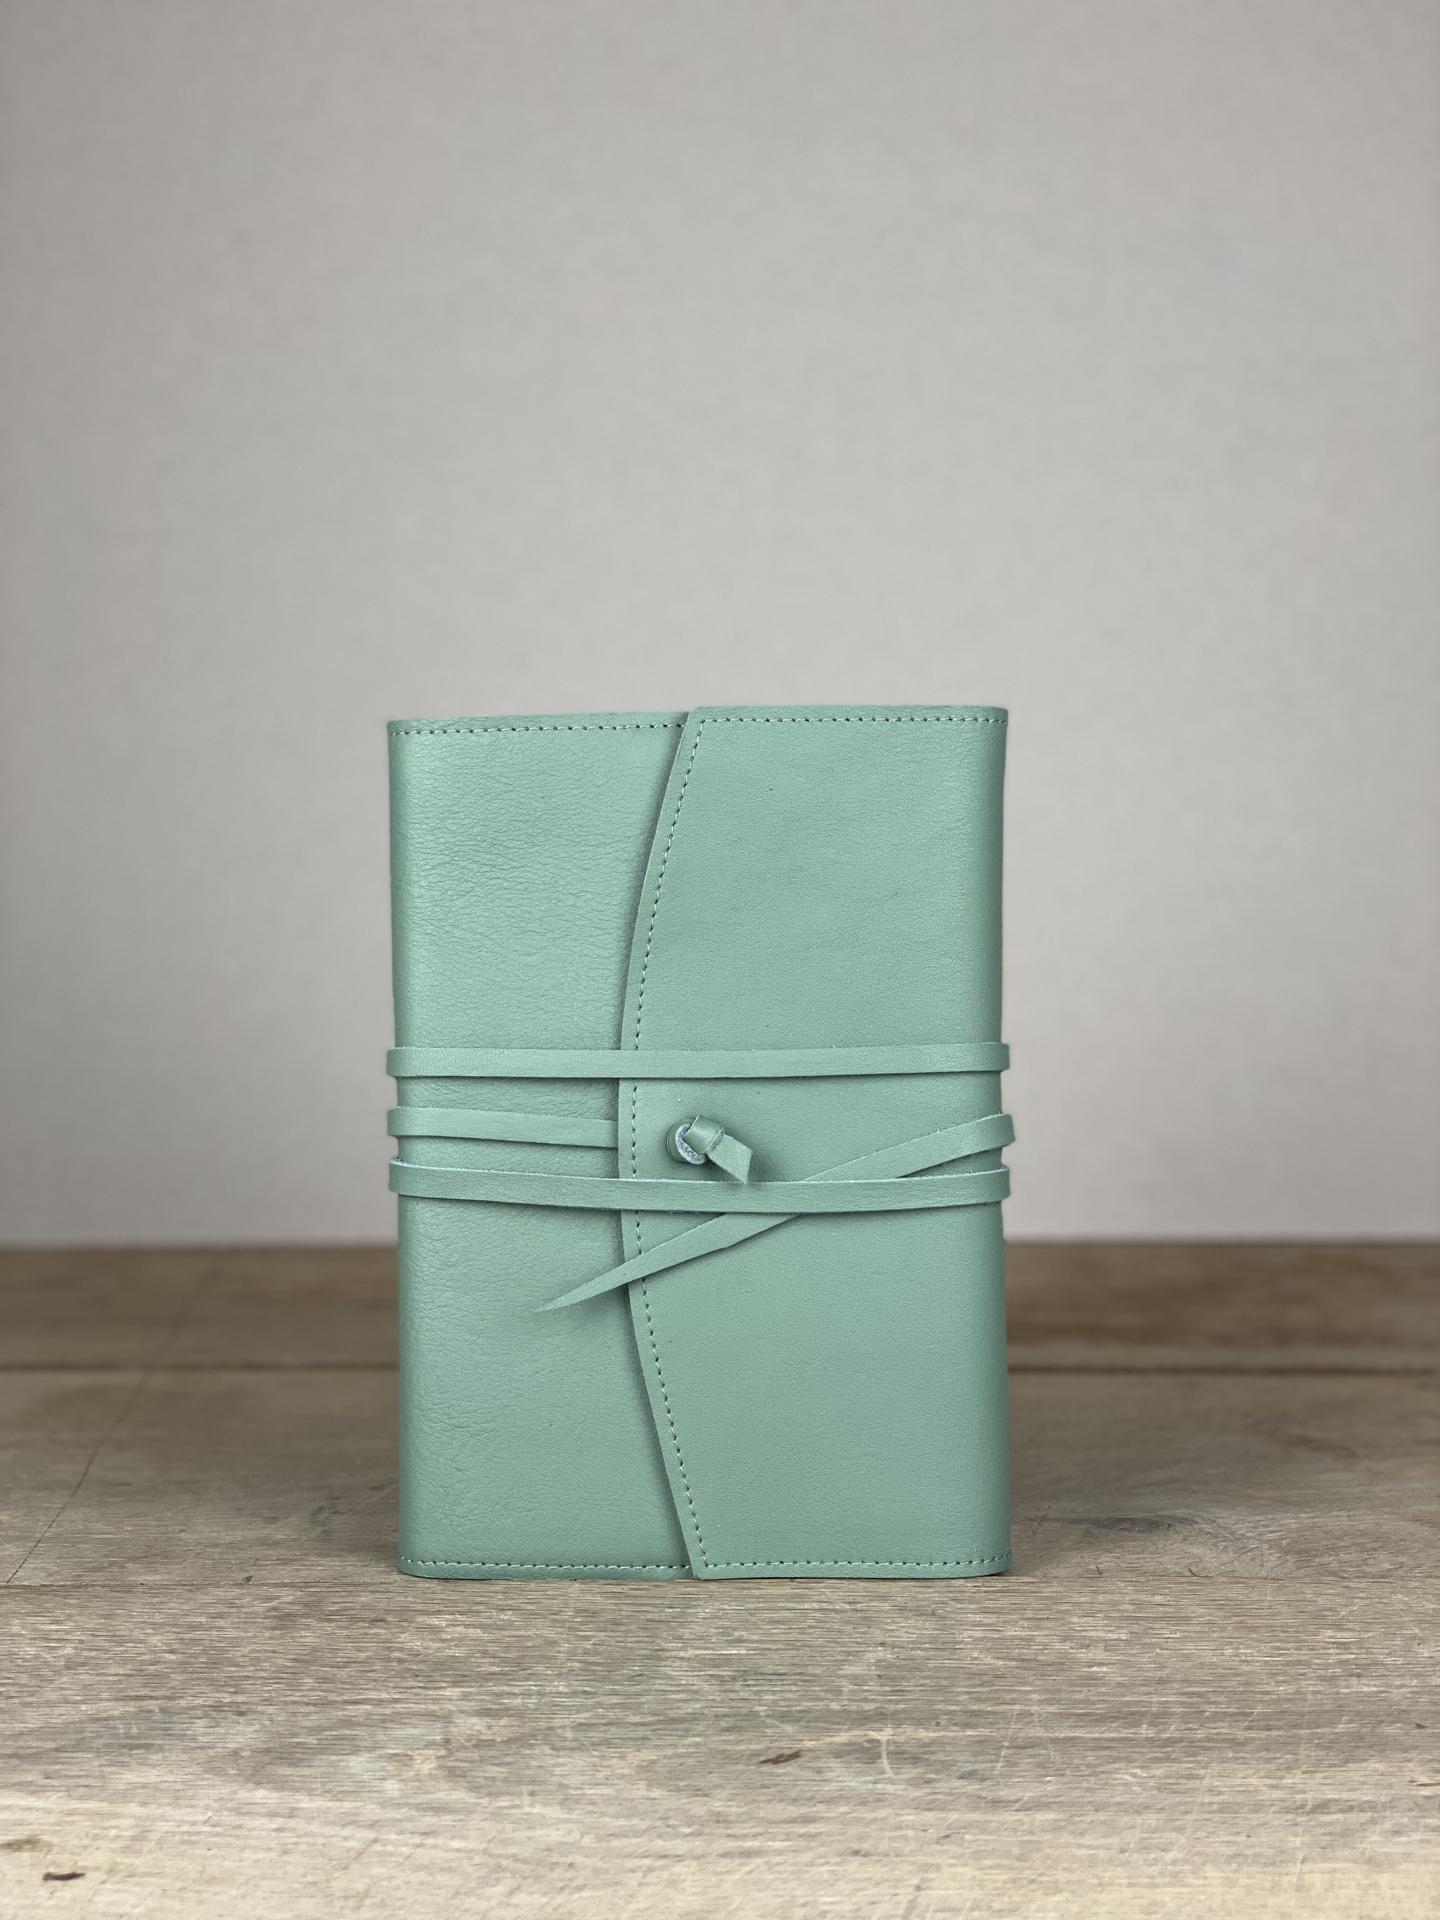 Notizbuch Leder mint